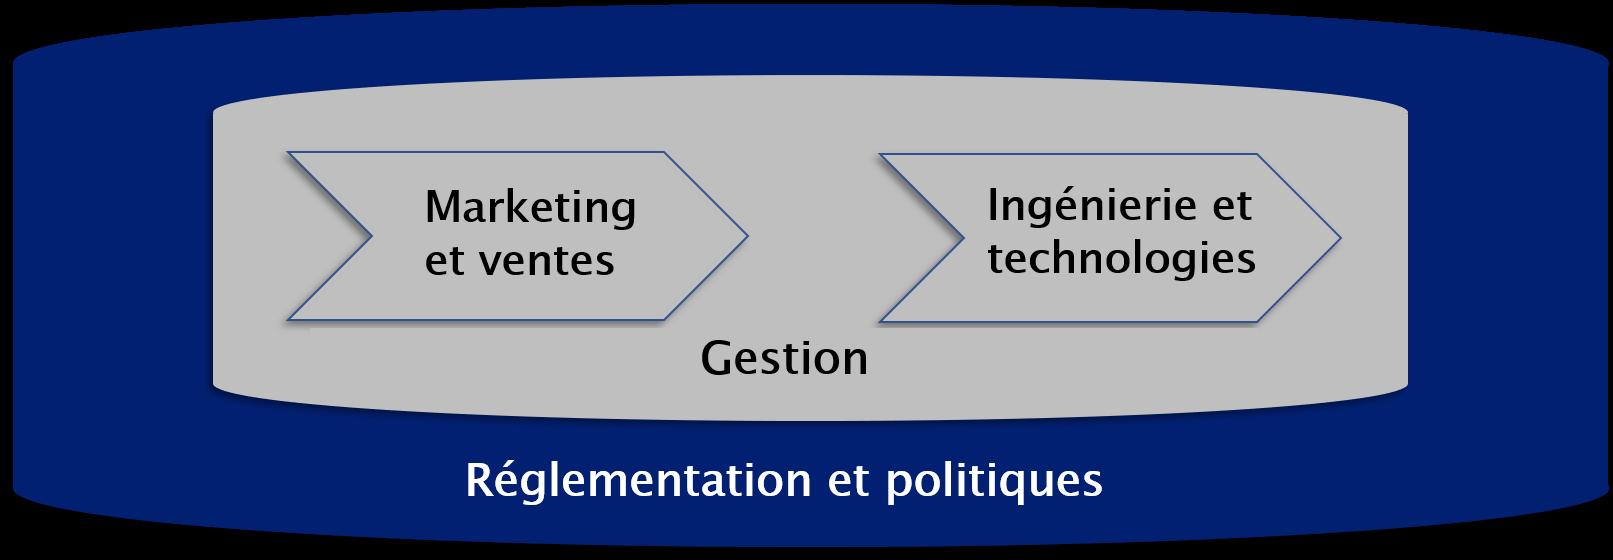 formation reglementation telecom tableau